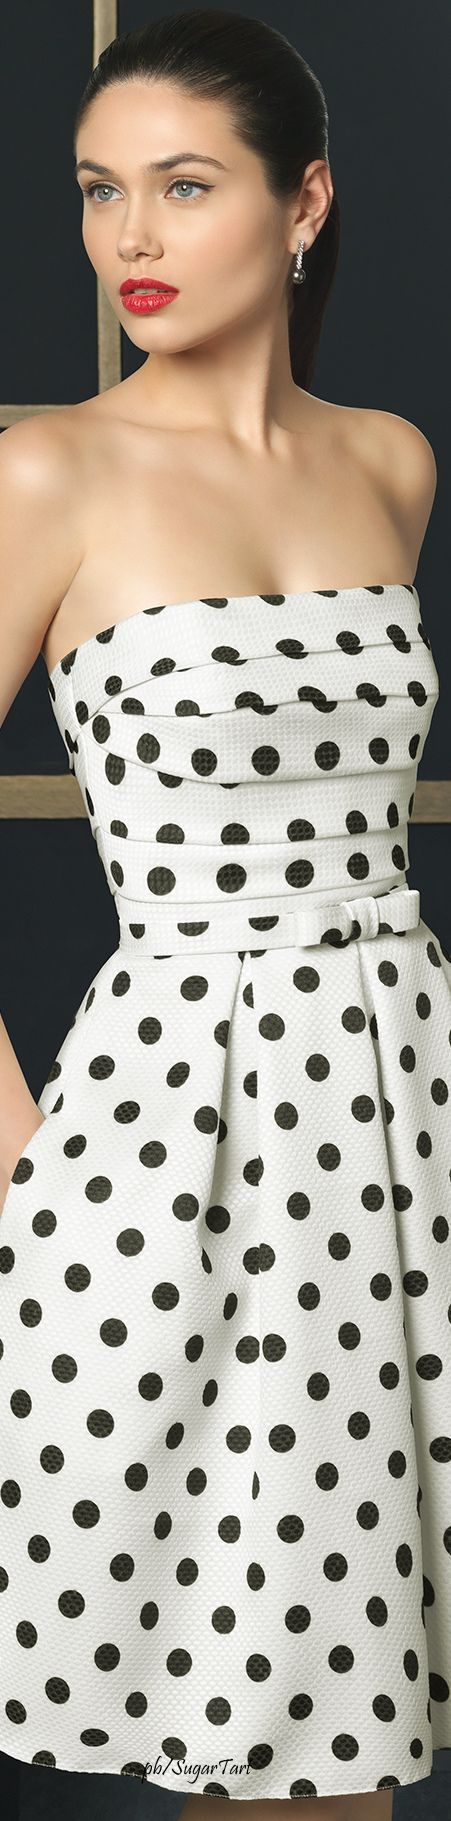 Rosa Clara dress. #polkadots #dresses